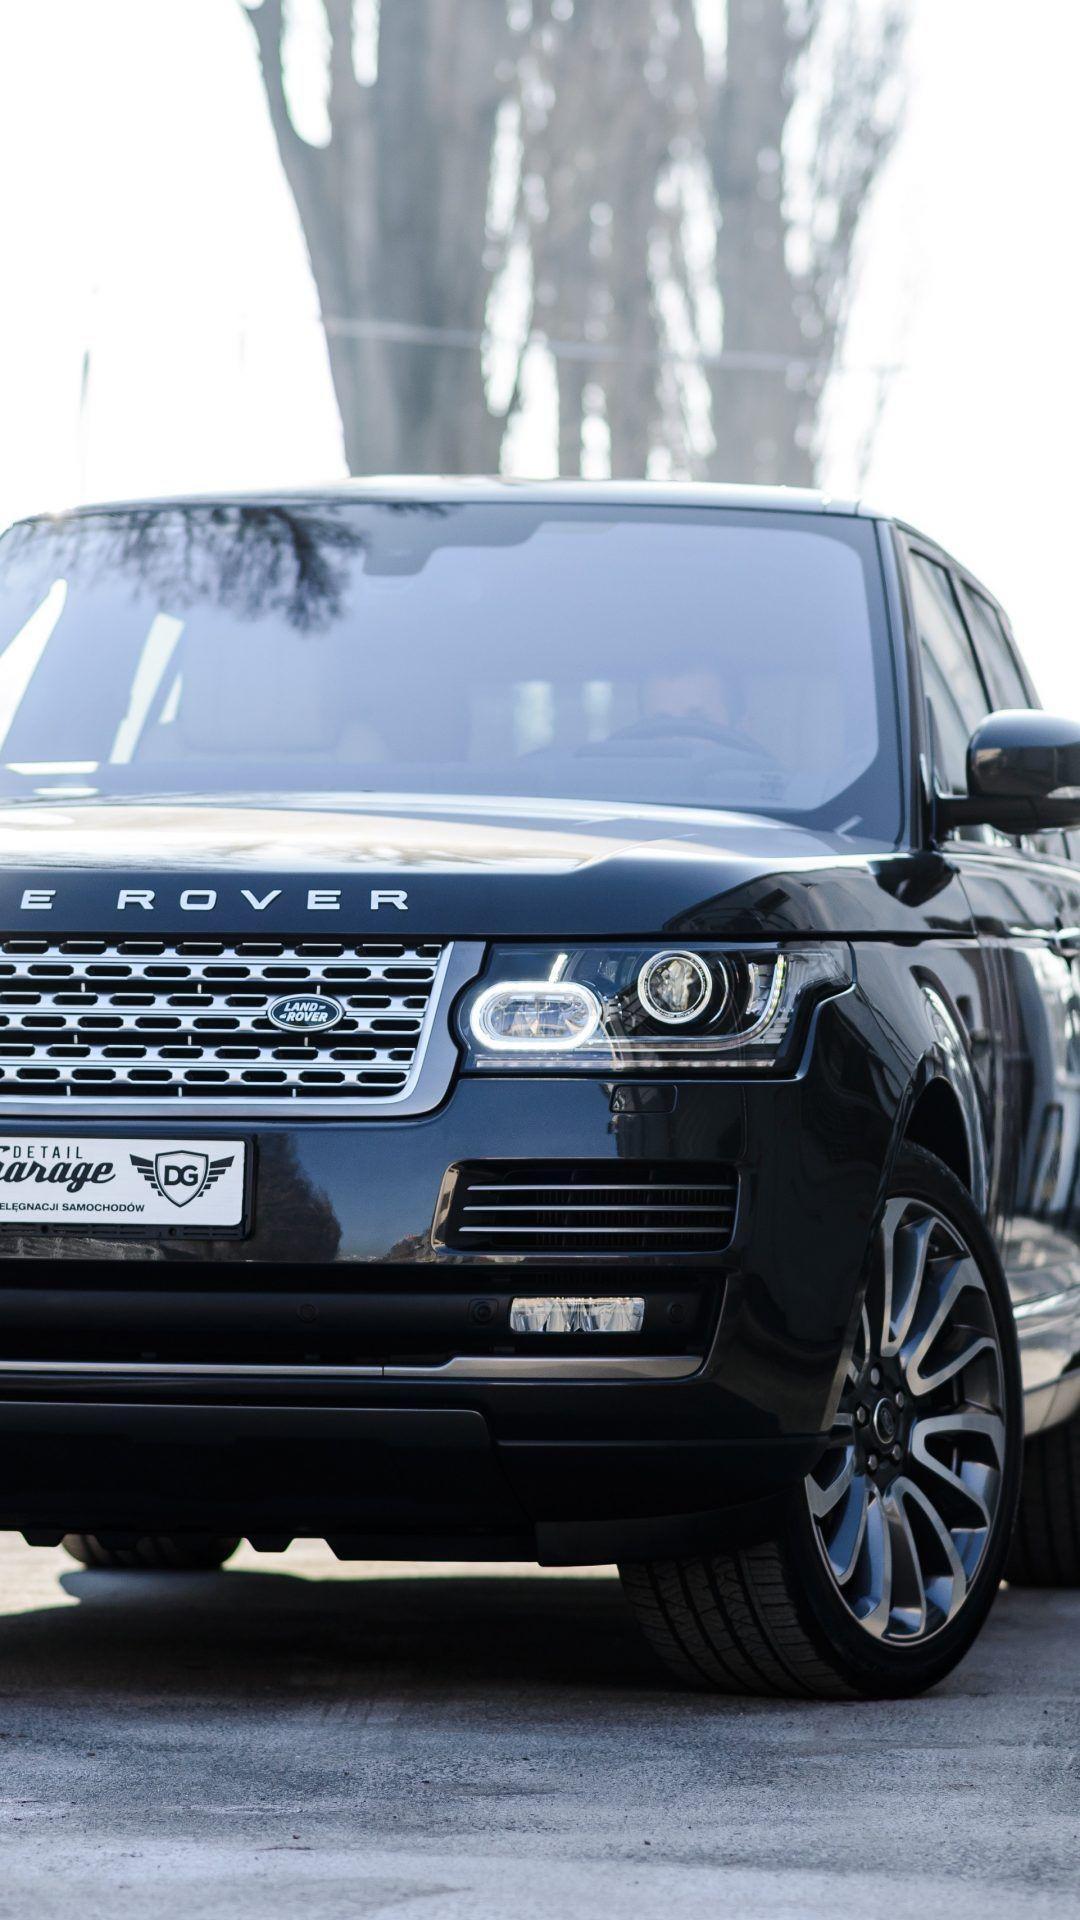 Range Rover Wallpapers - Top Free Range ...